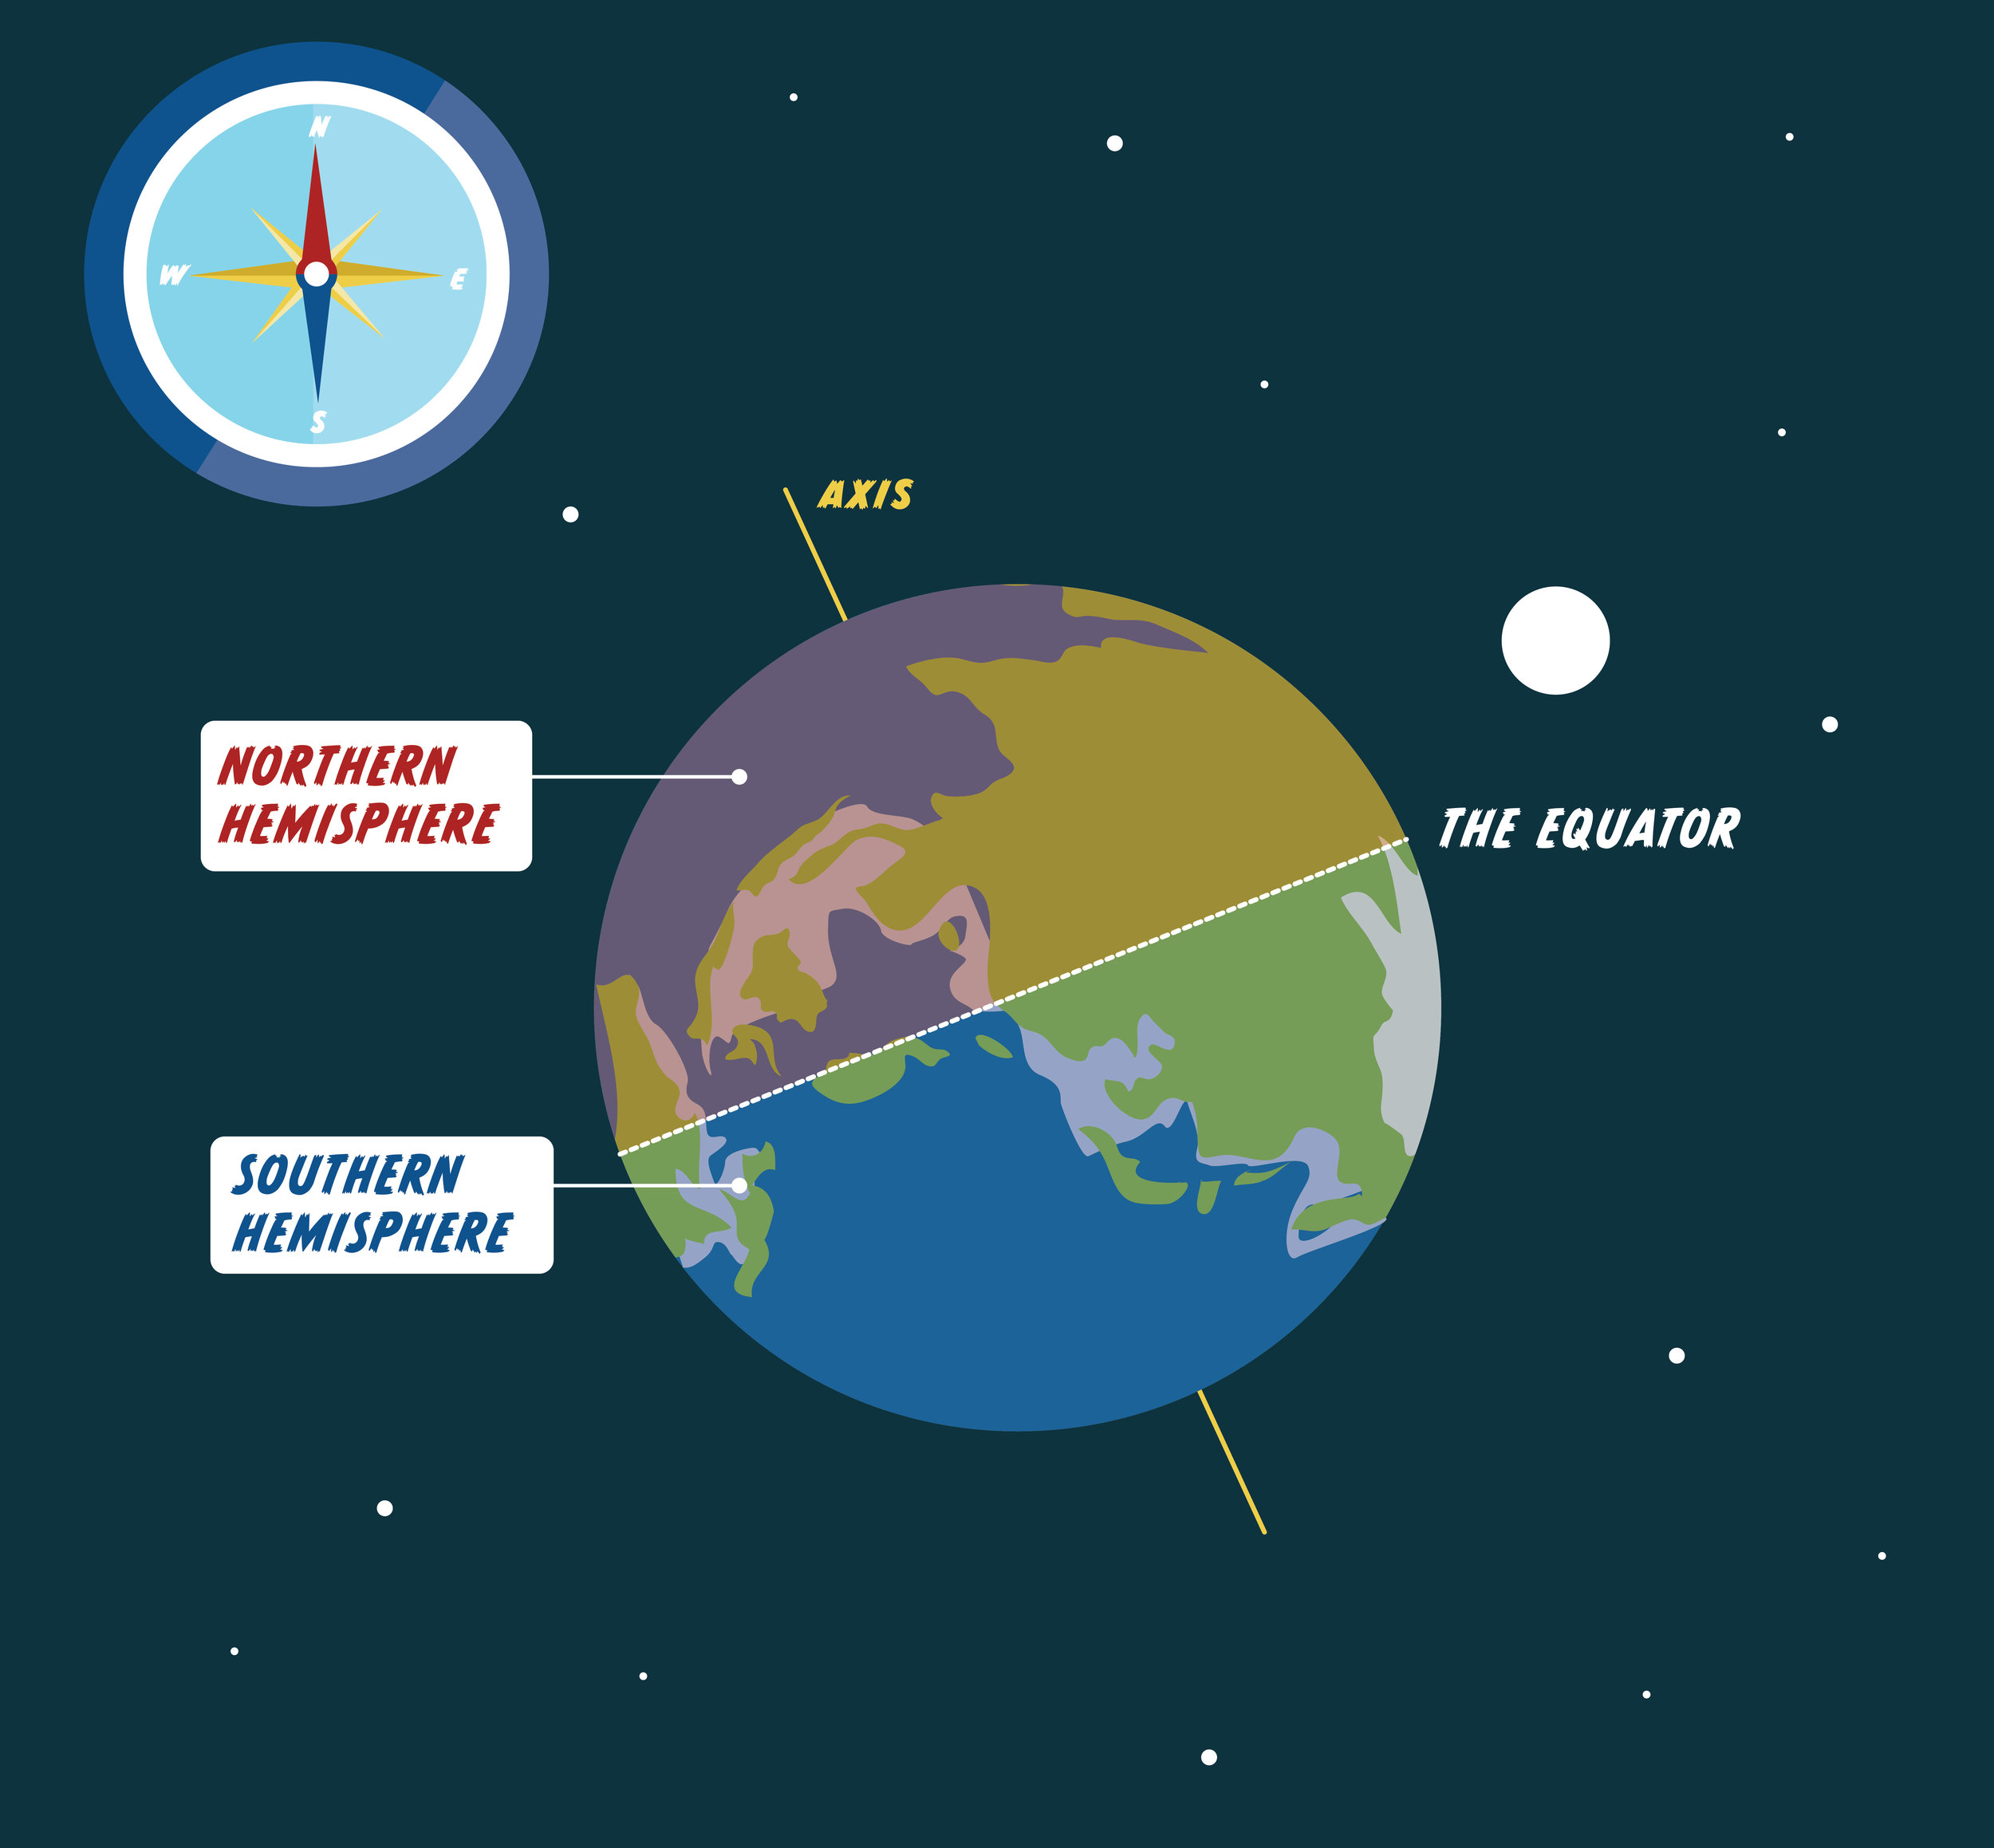 AxisandHemispheresjpg_the hemisphere.jpg